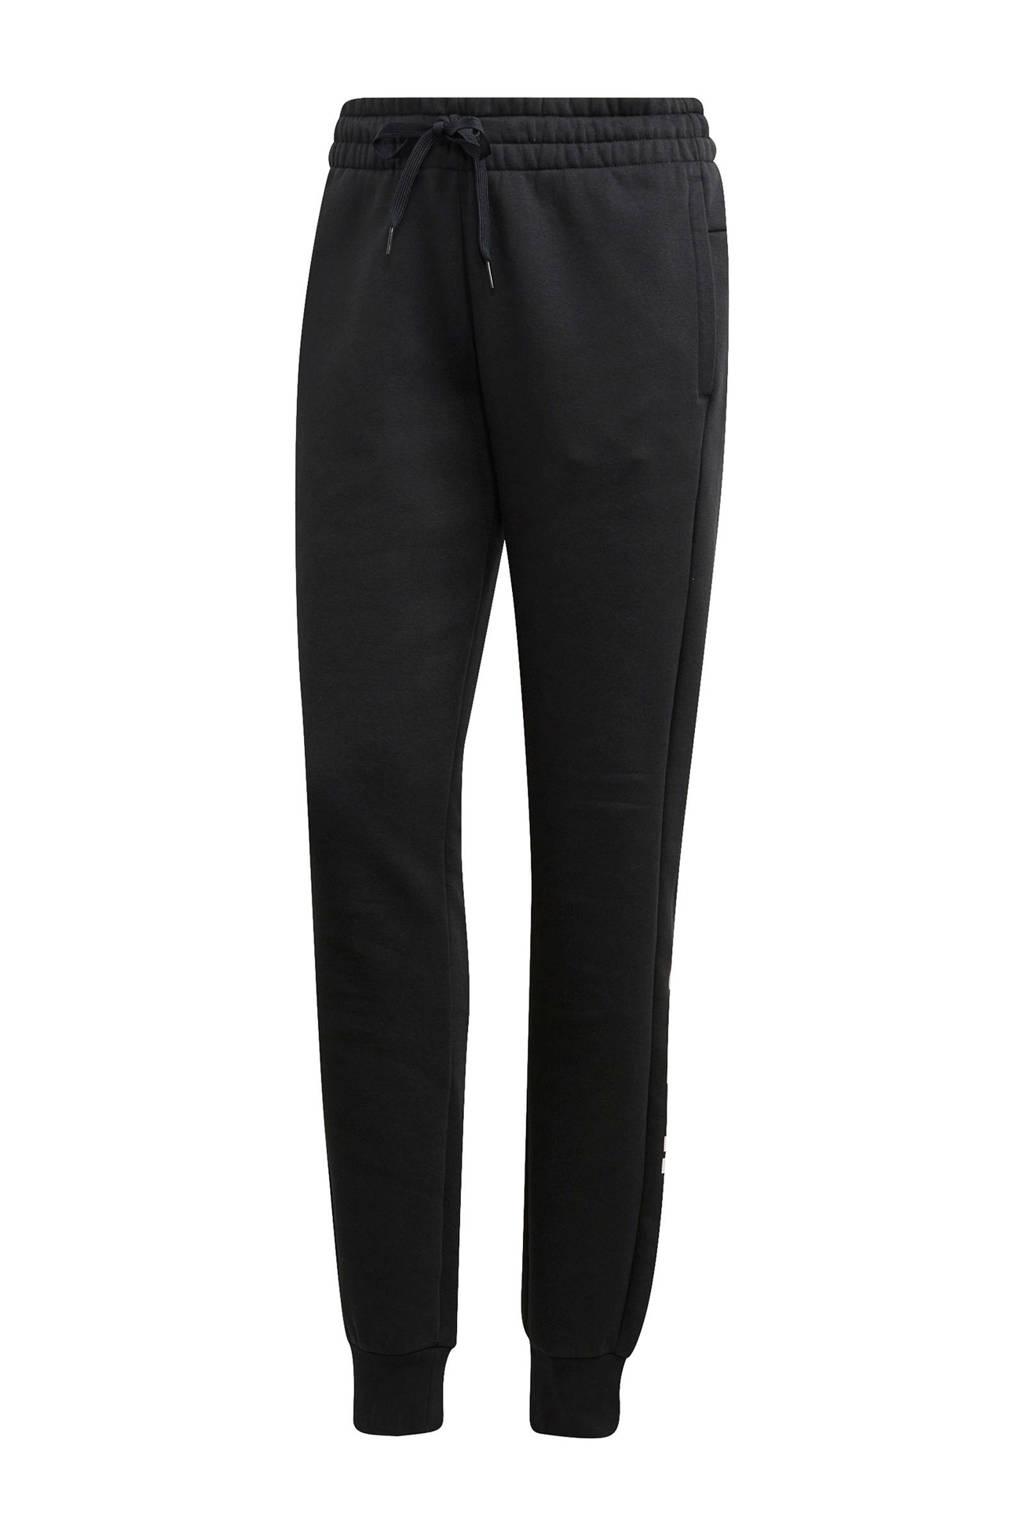 adidas Performance regular fit joggingbroek zwart/wit, Zwart/wit